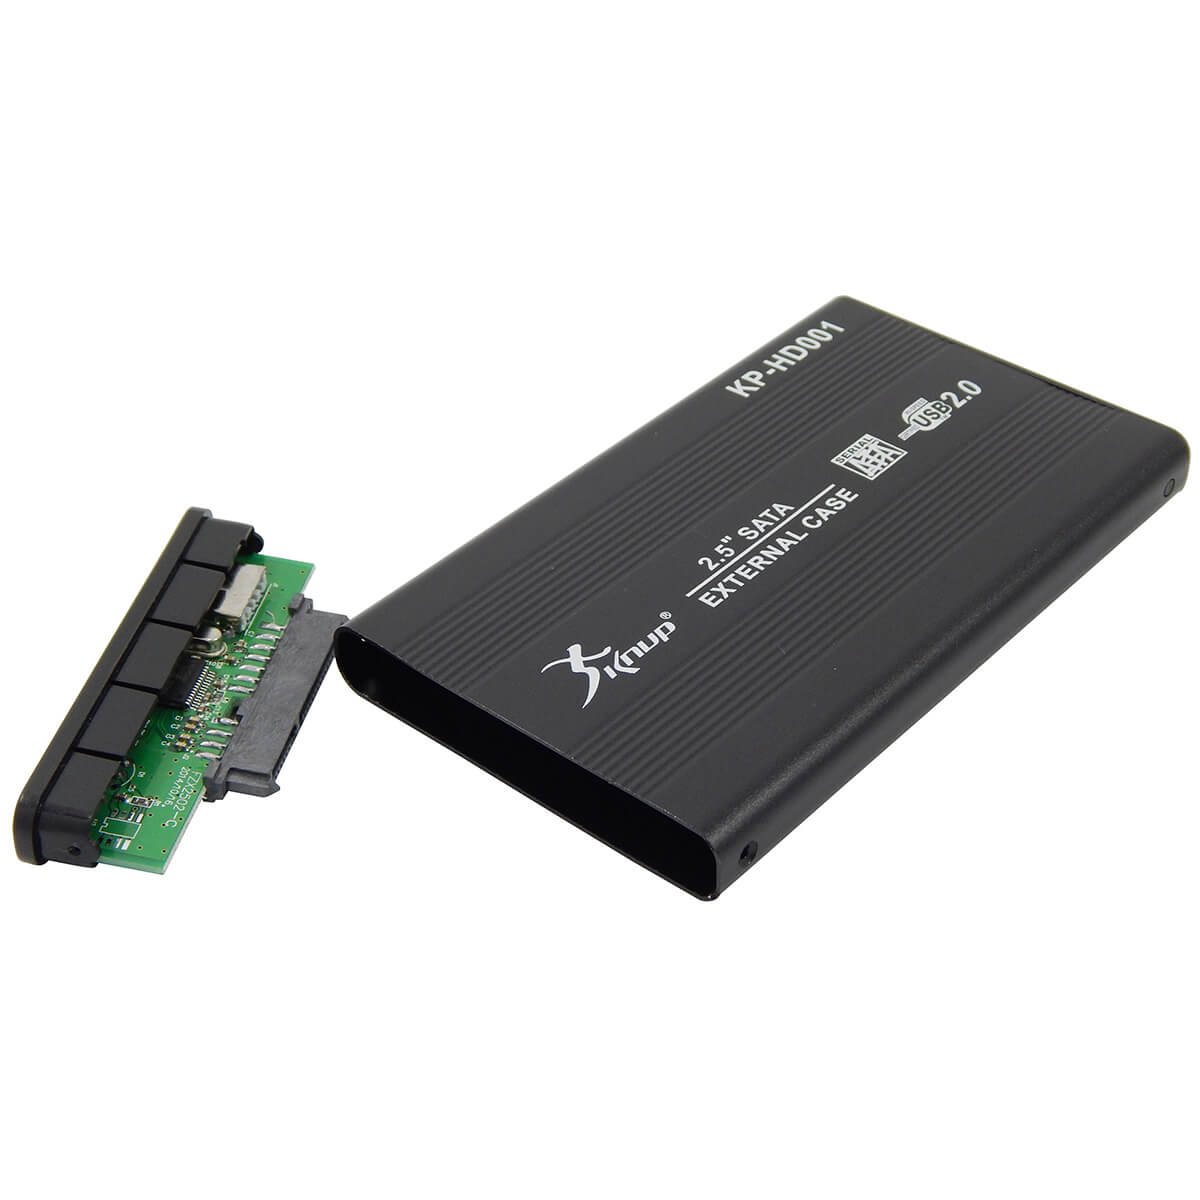 Case Gaveta Externa para HD Sata 2.5 USB 2.0 Knup KP-HD001 Preto